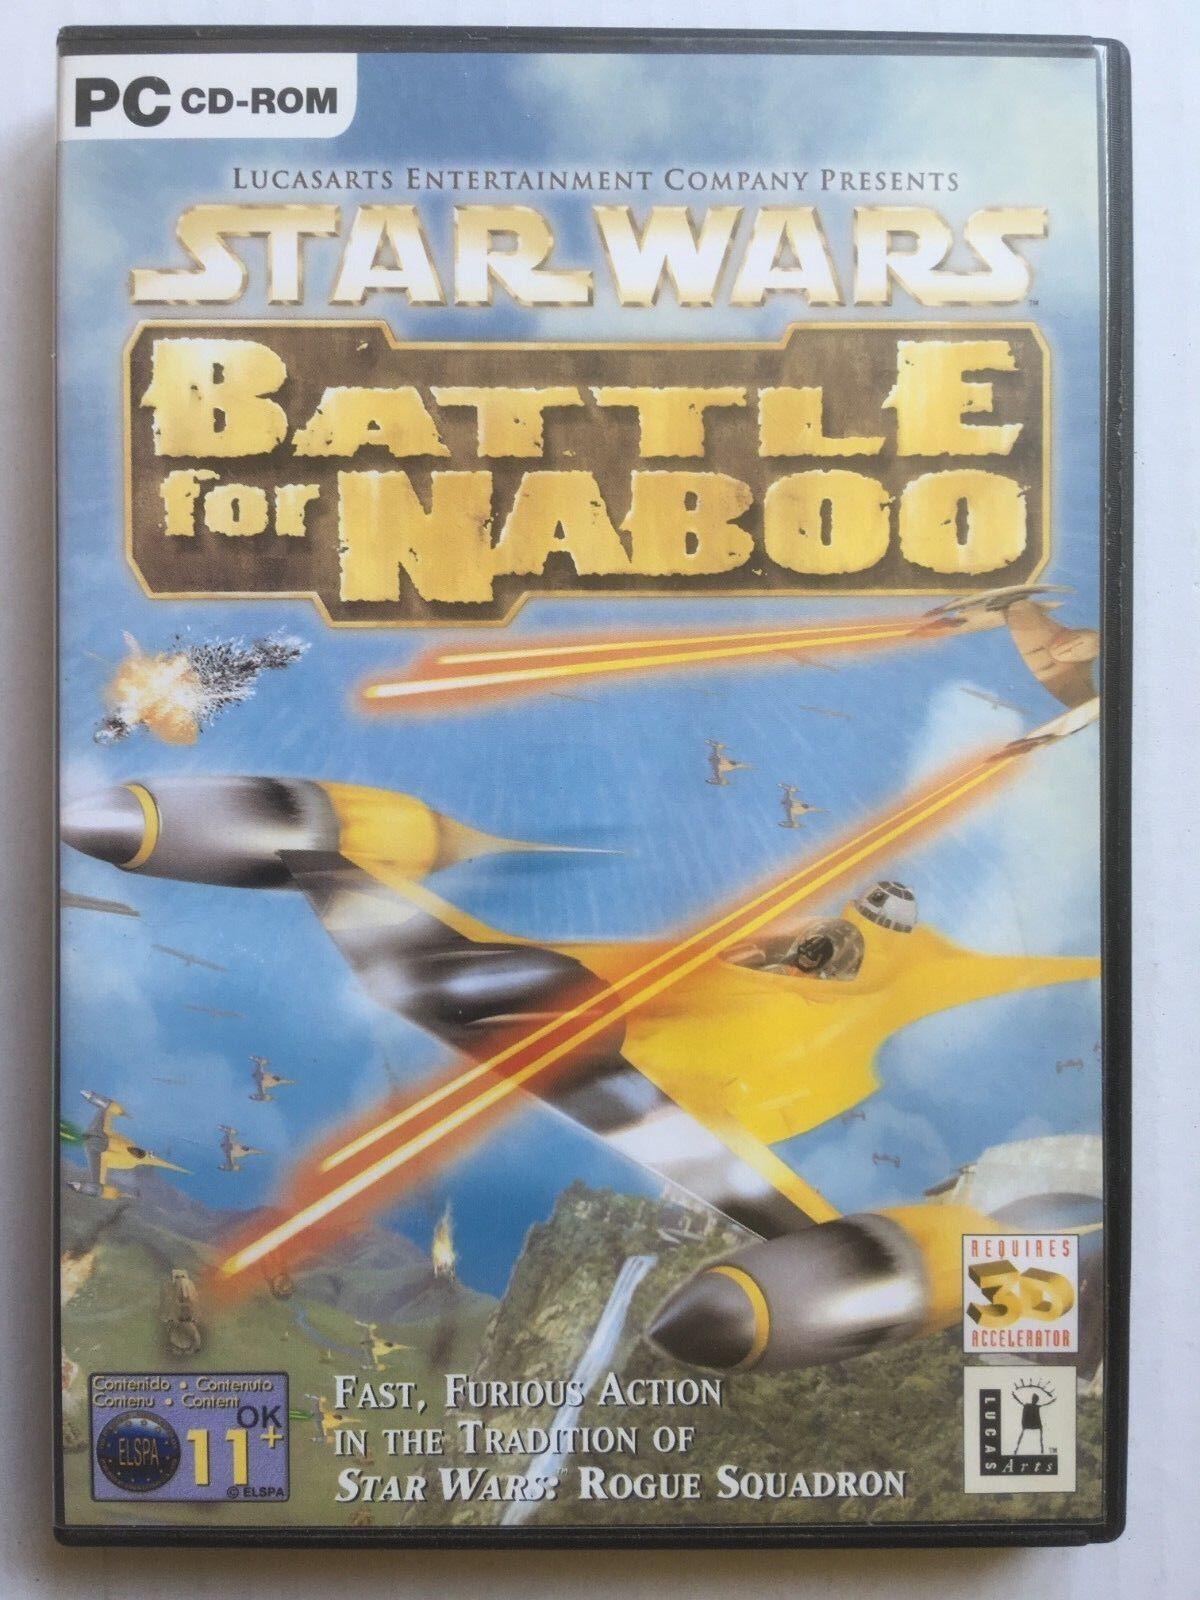 PC CD ROM - STAR WARS - BATTLE FOR NABOO - pas cher StarWars